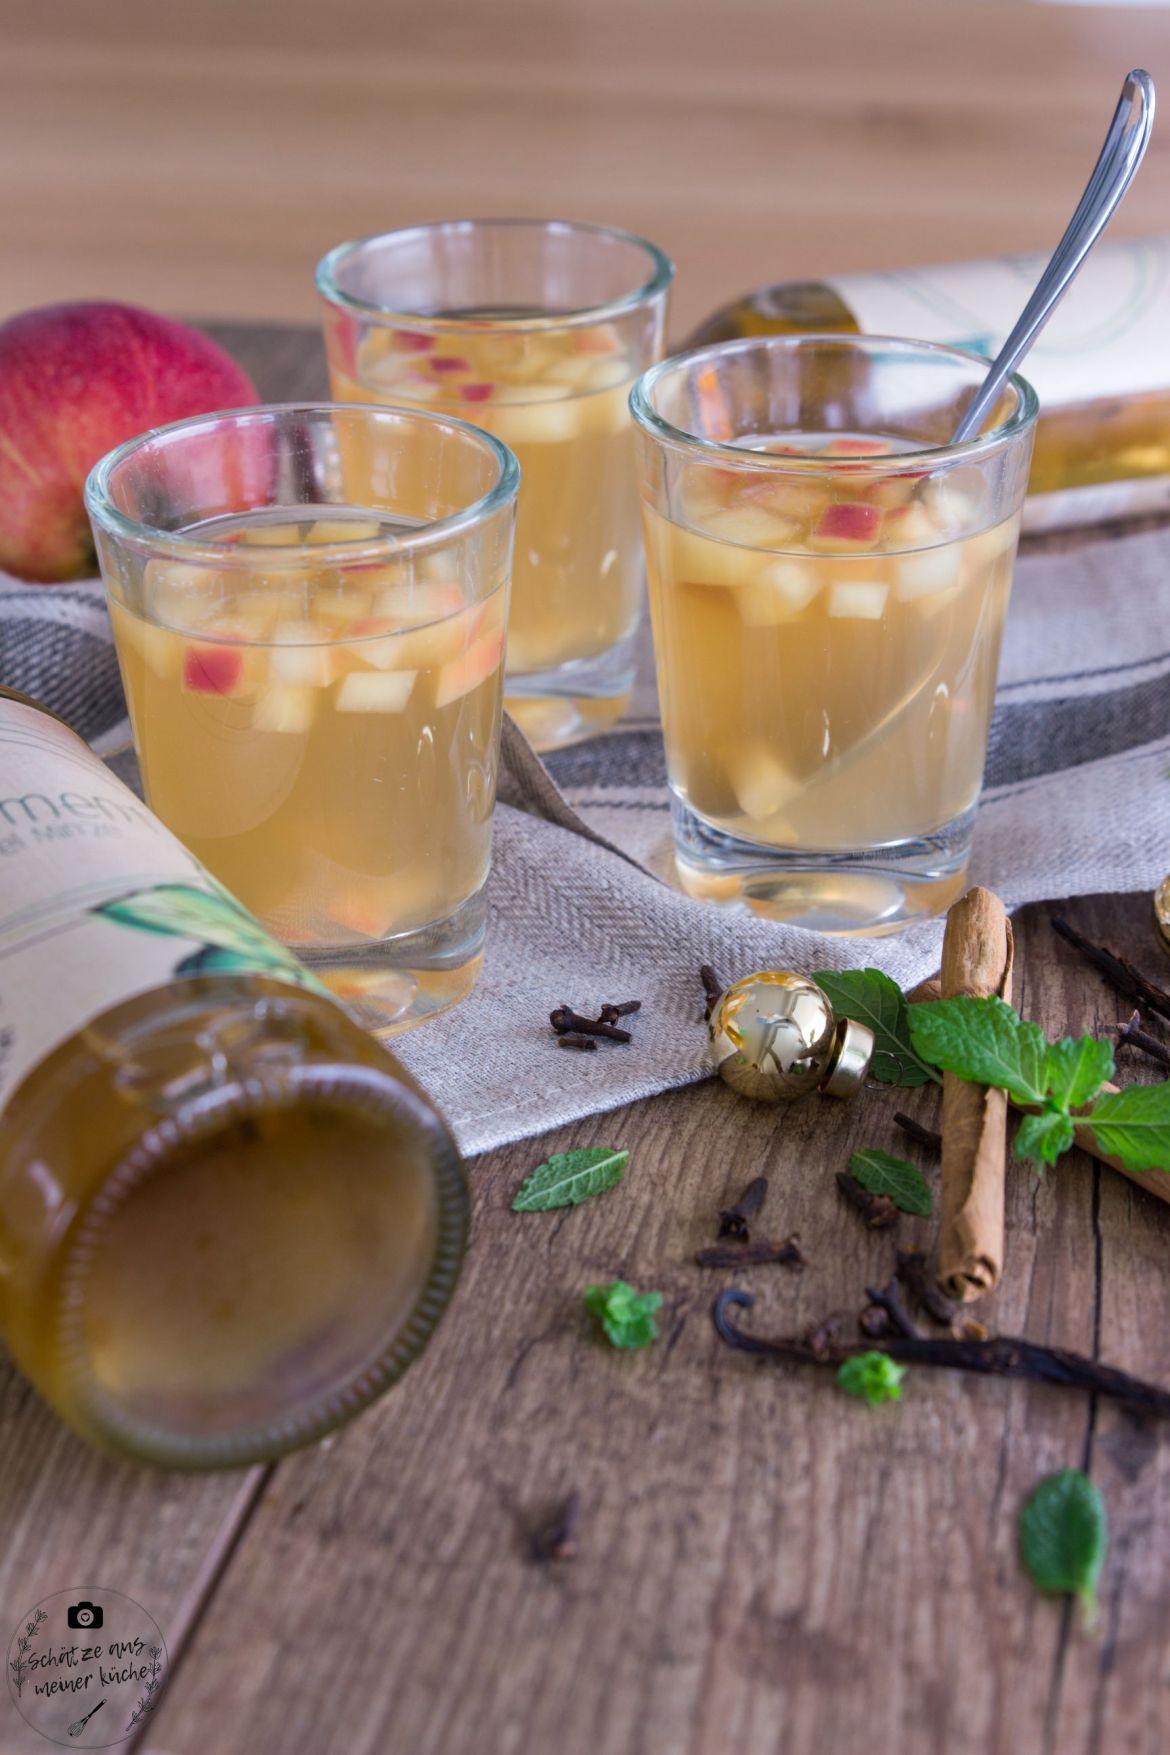 Apfel-Minze-Limonade Apfelpunsch Limoment